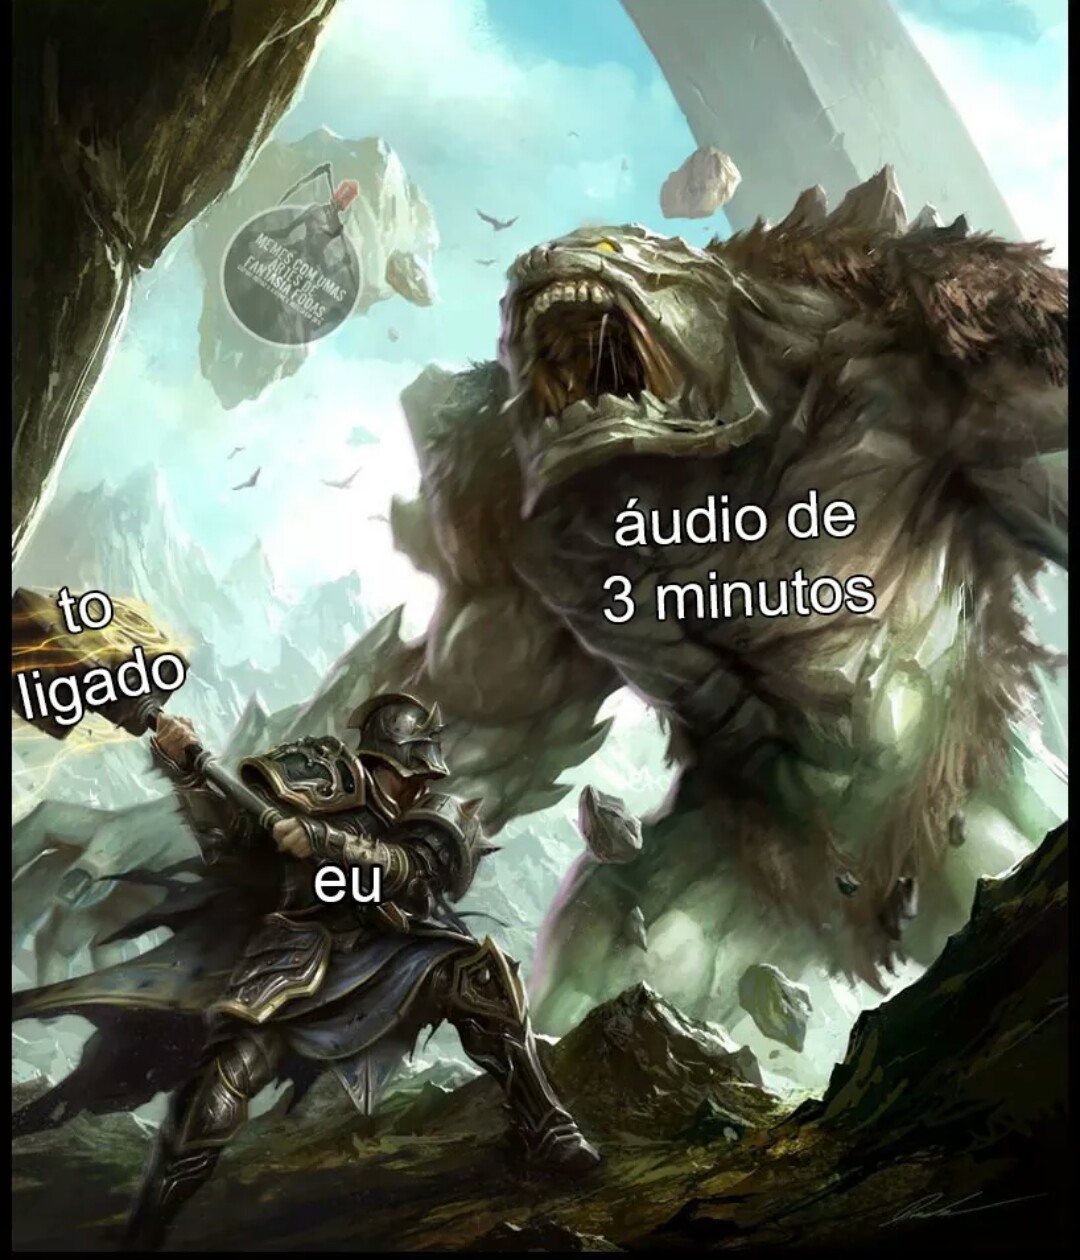 3 min dr áudio é forçar a amizade - meme